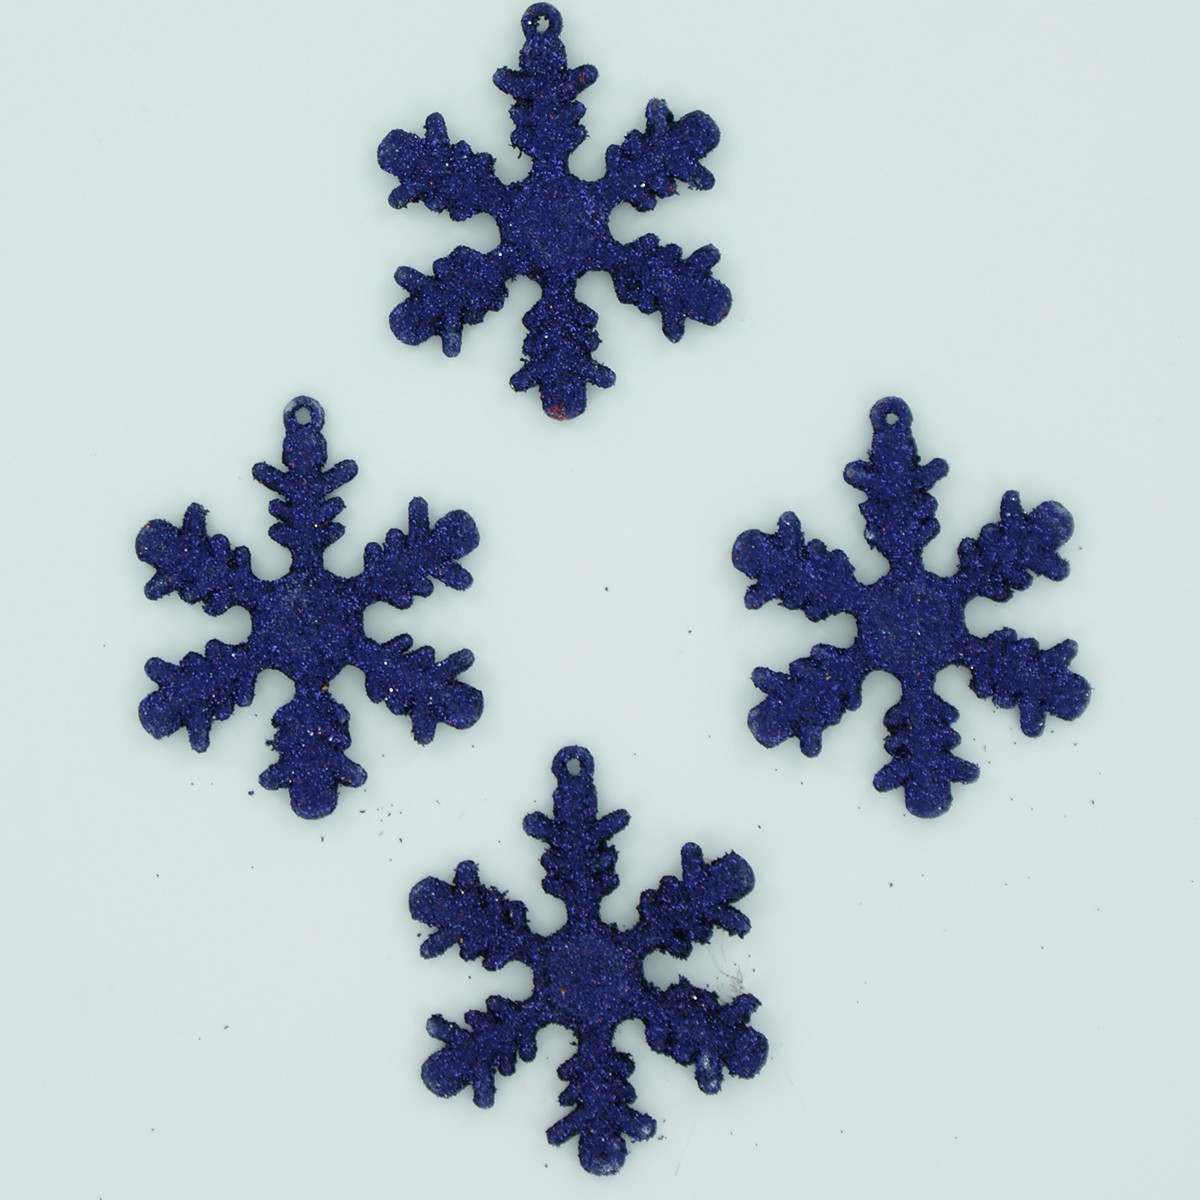 12 x 50mm Midnight Blue Shatterproof Snowflakes